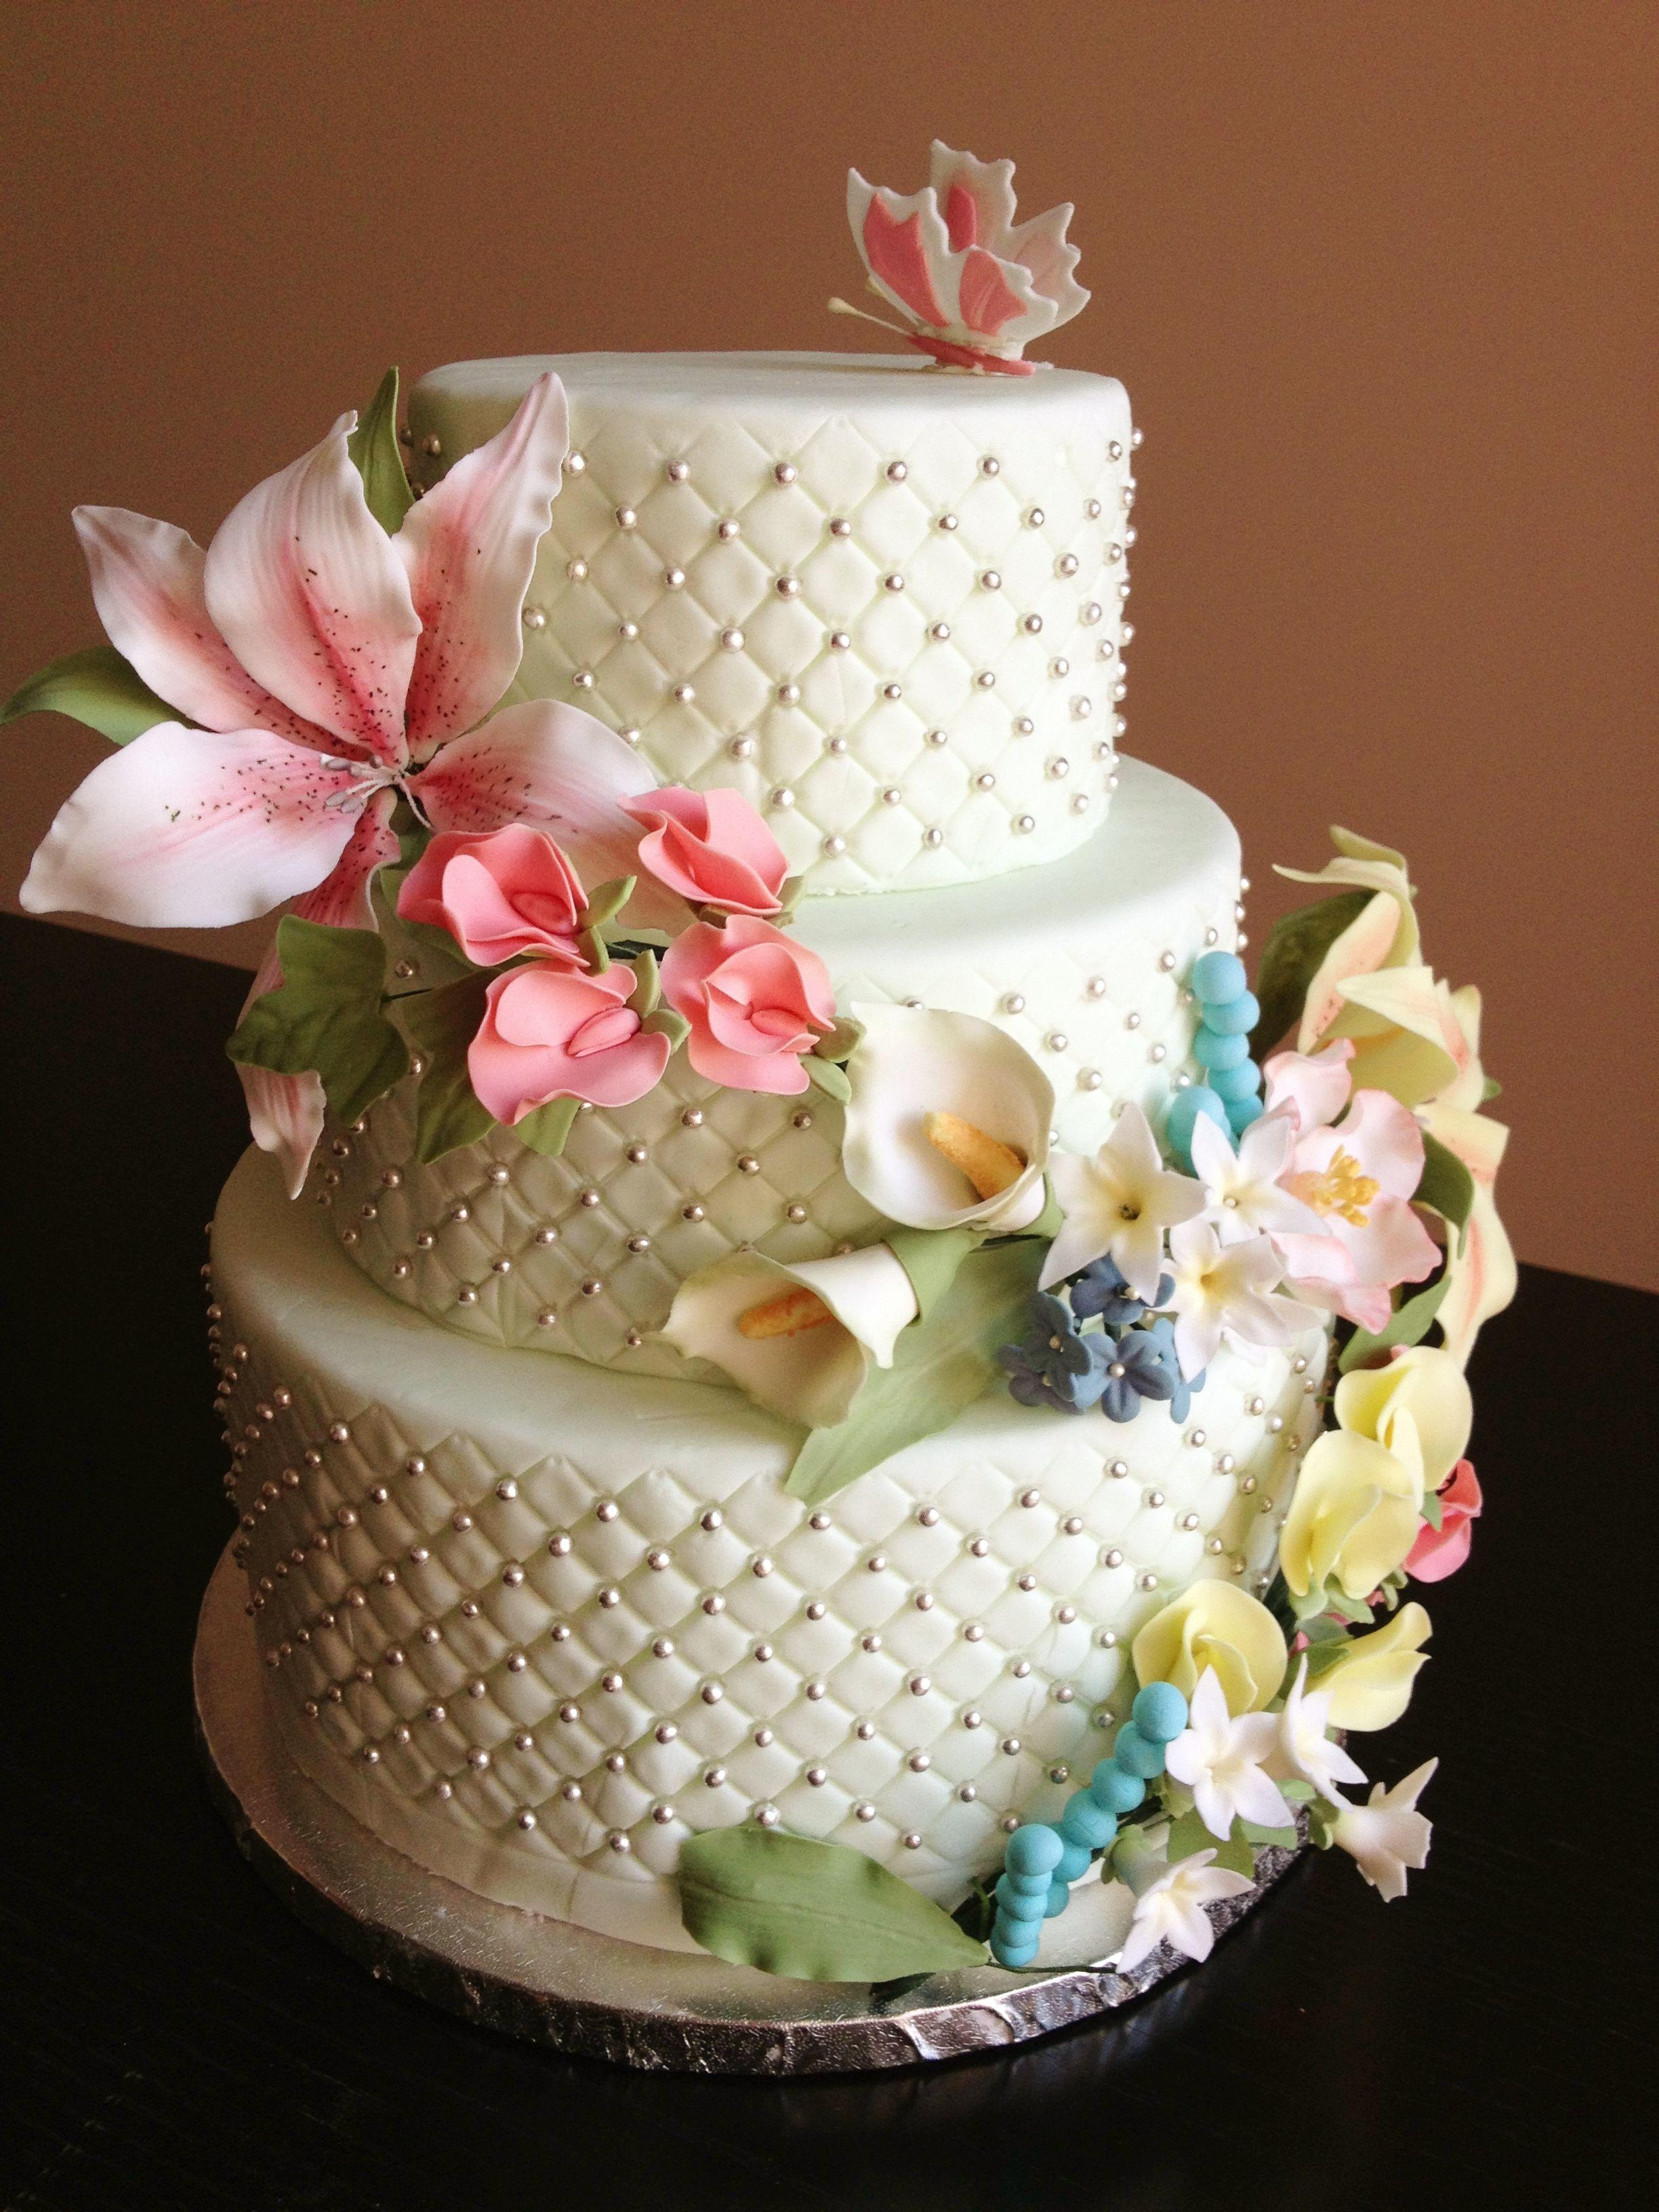 Fondant 3 Tier Cake With Gum Paste Flowers Stargazer Lily